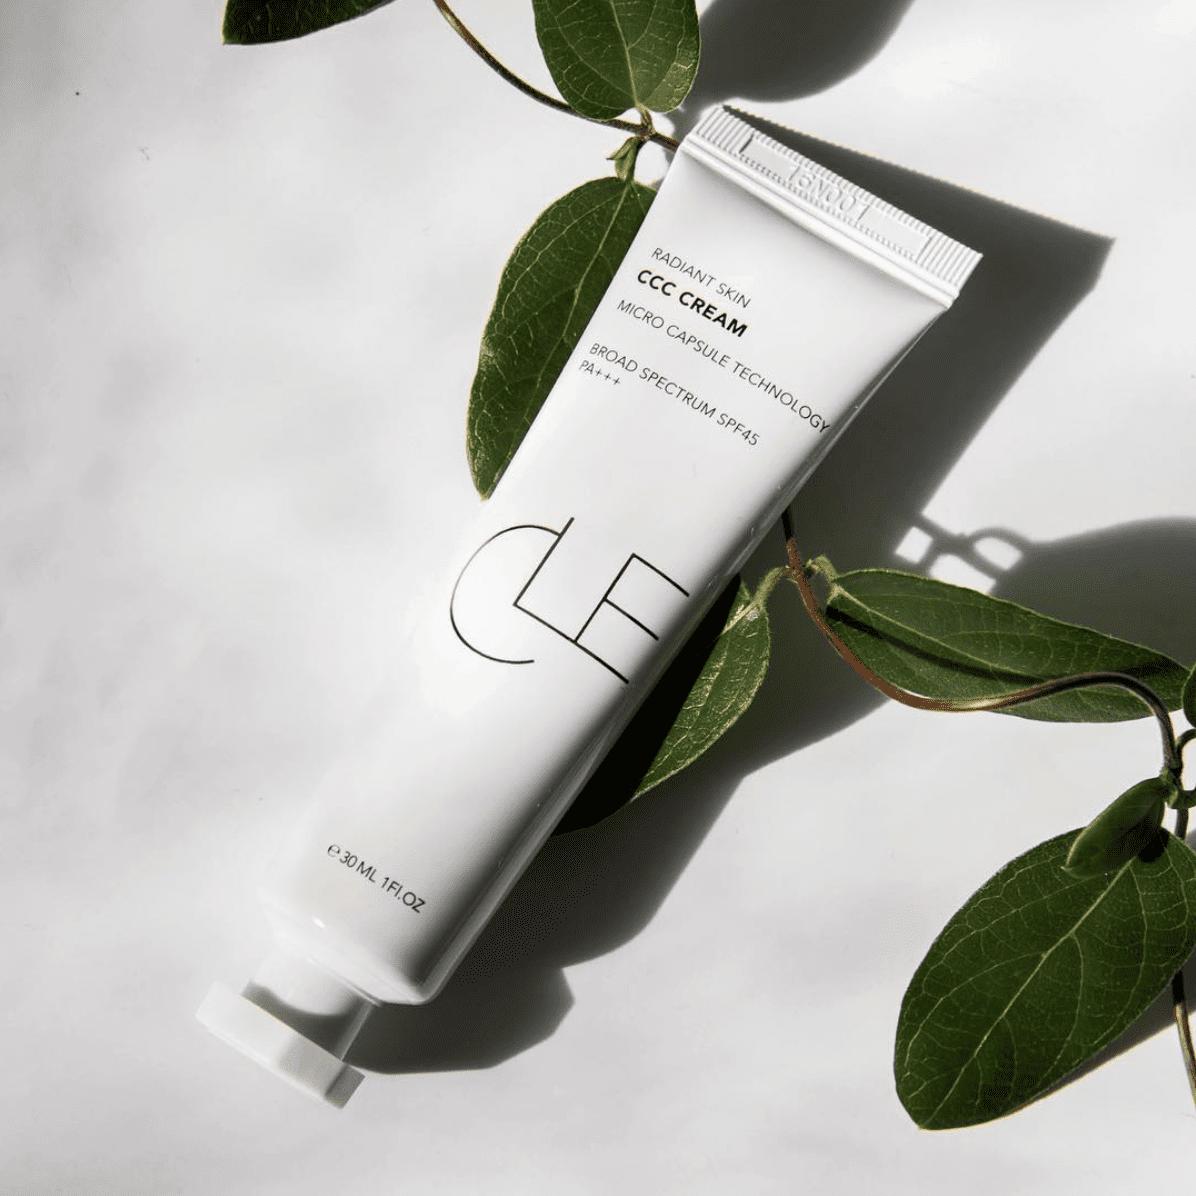 CCC Cream clé cosmetics beauty refresh skincare in the pursuit